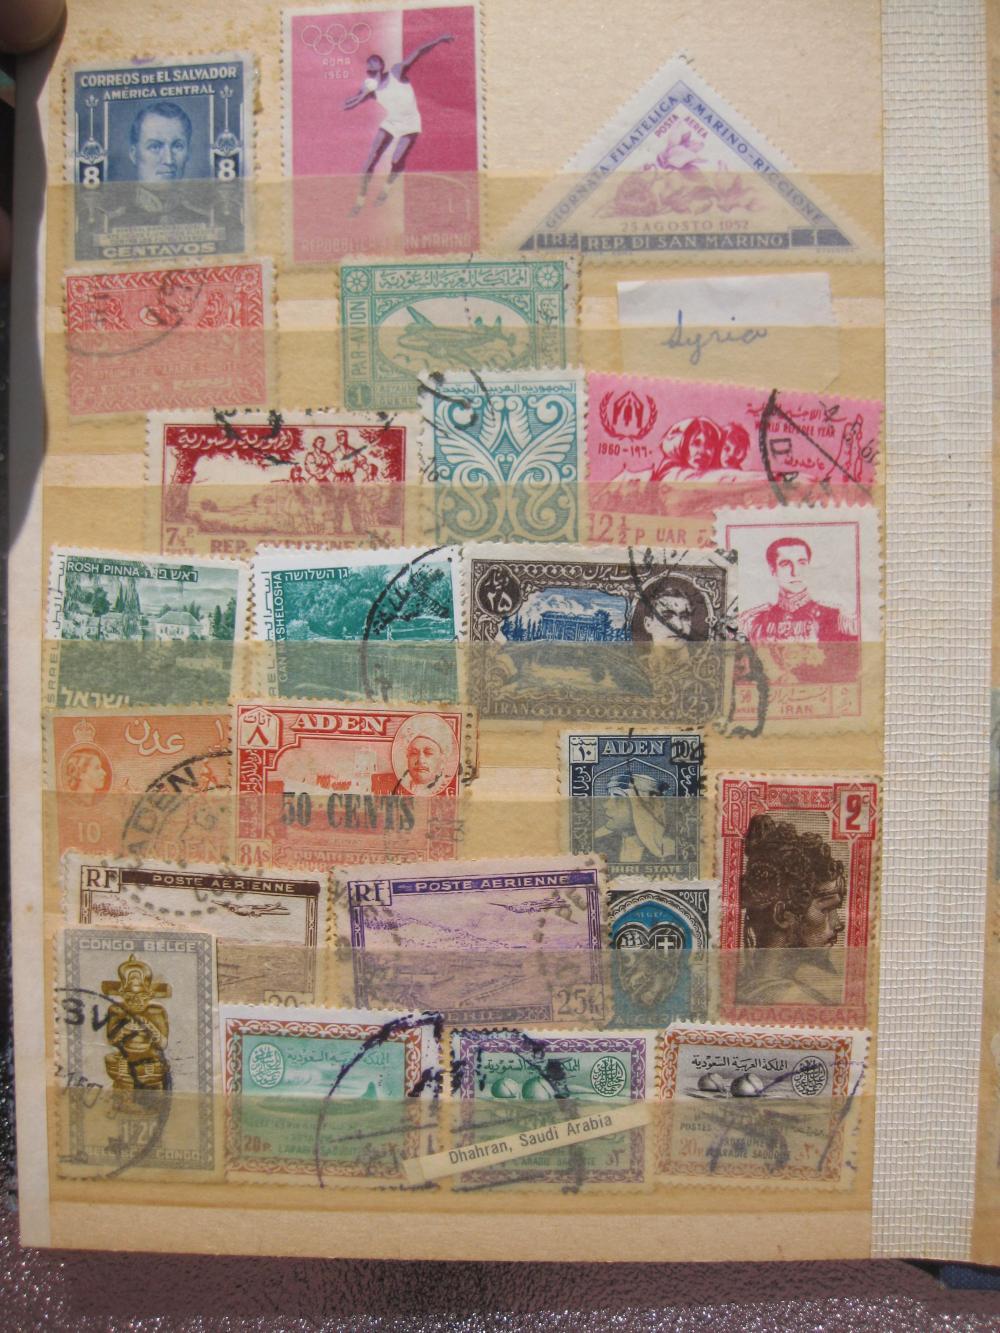 Israel, San Marino, Saudi Arabia, Algeria, Aden, UAR, Iran, Syria, Madagascar: Collection of antique postal stamps